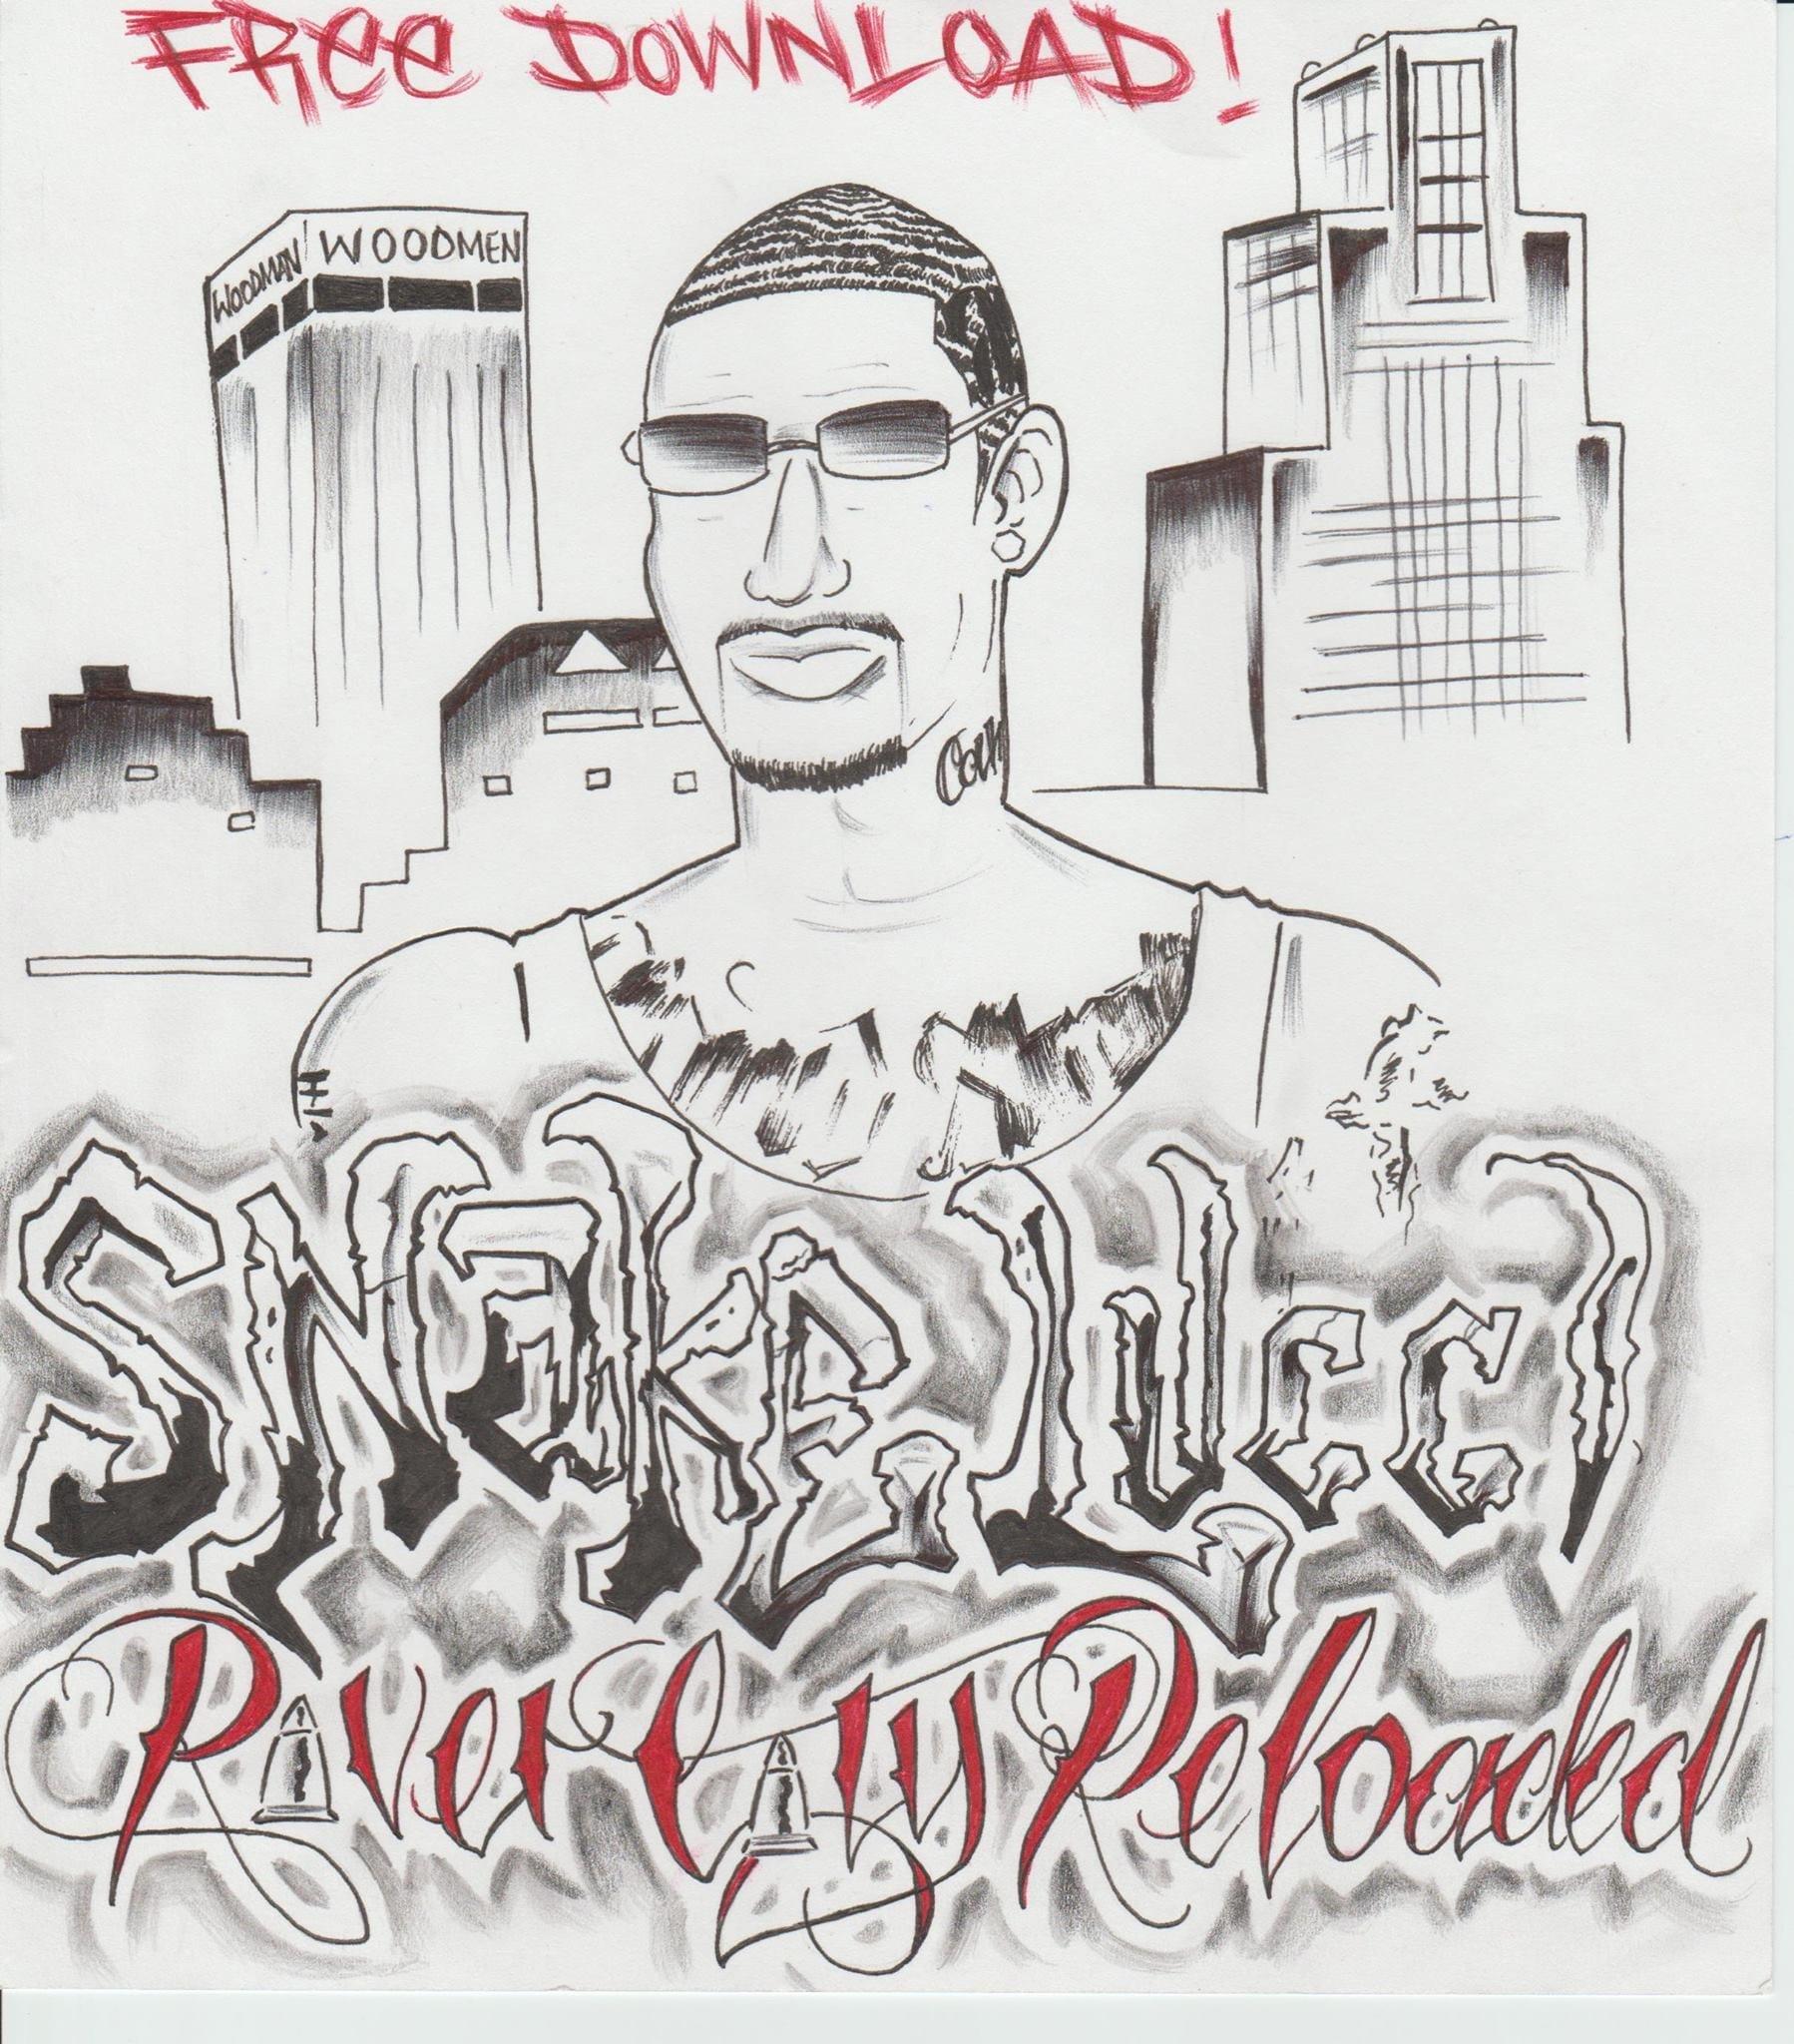 Snake Lucci - River City Reloaded (Album)